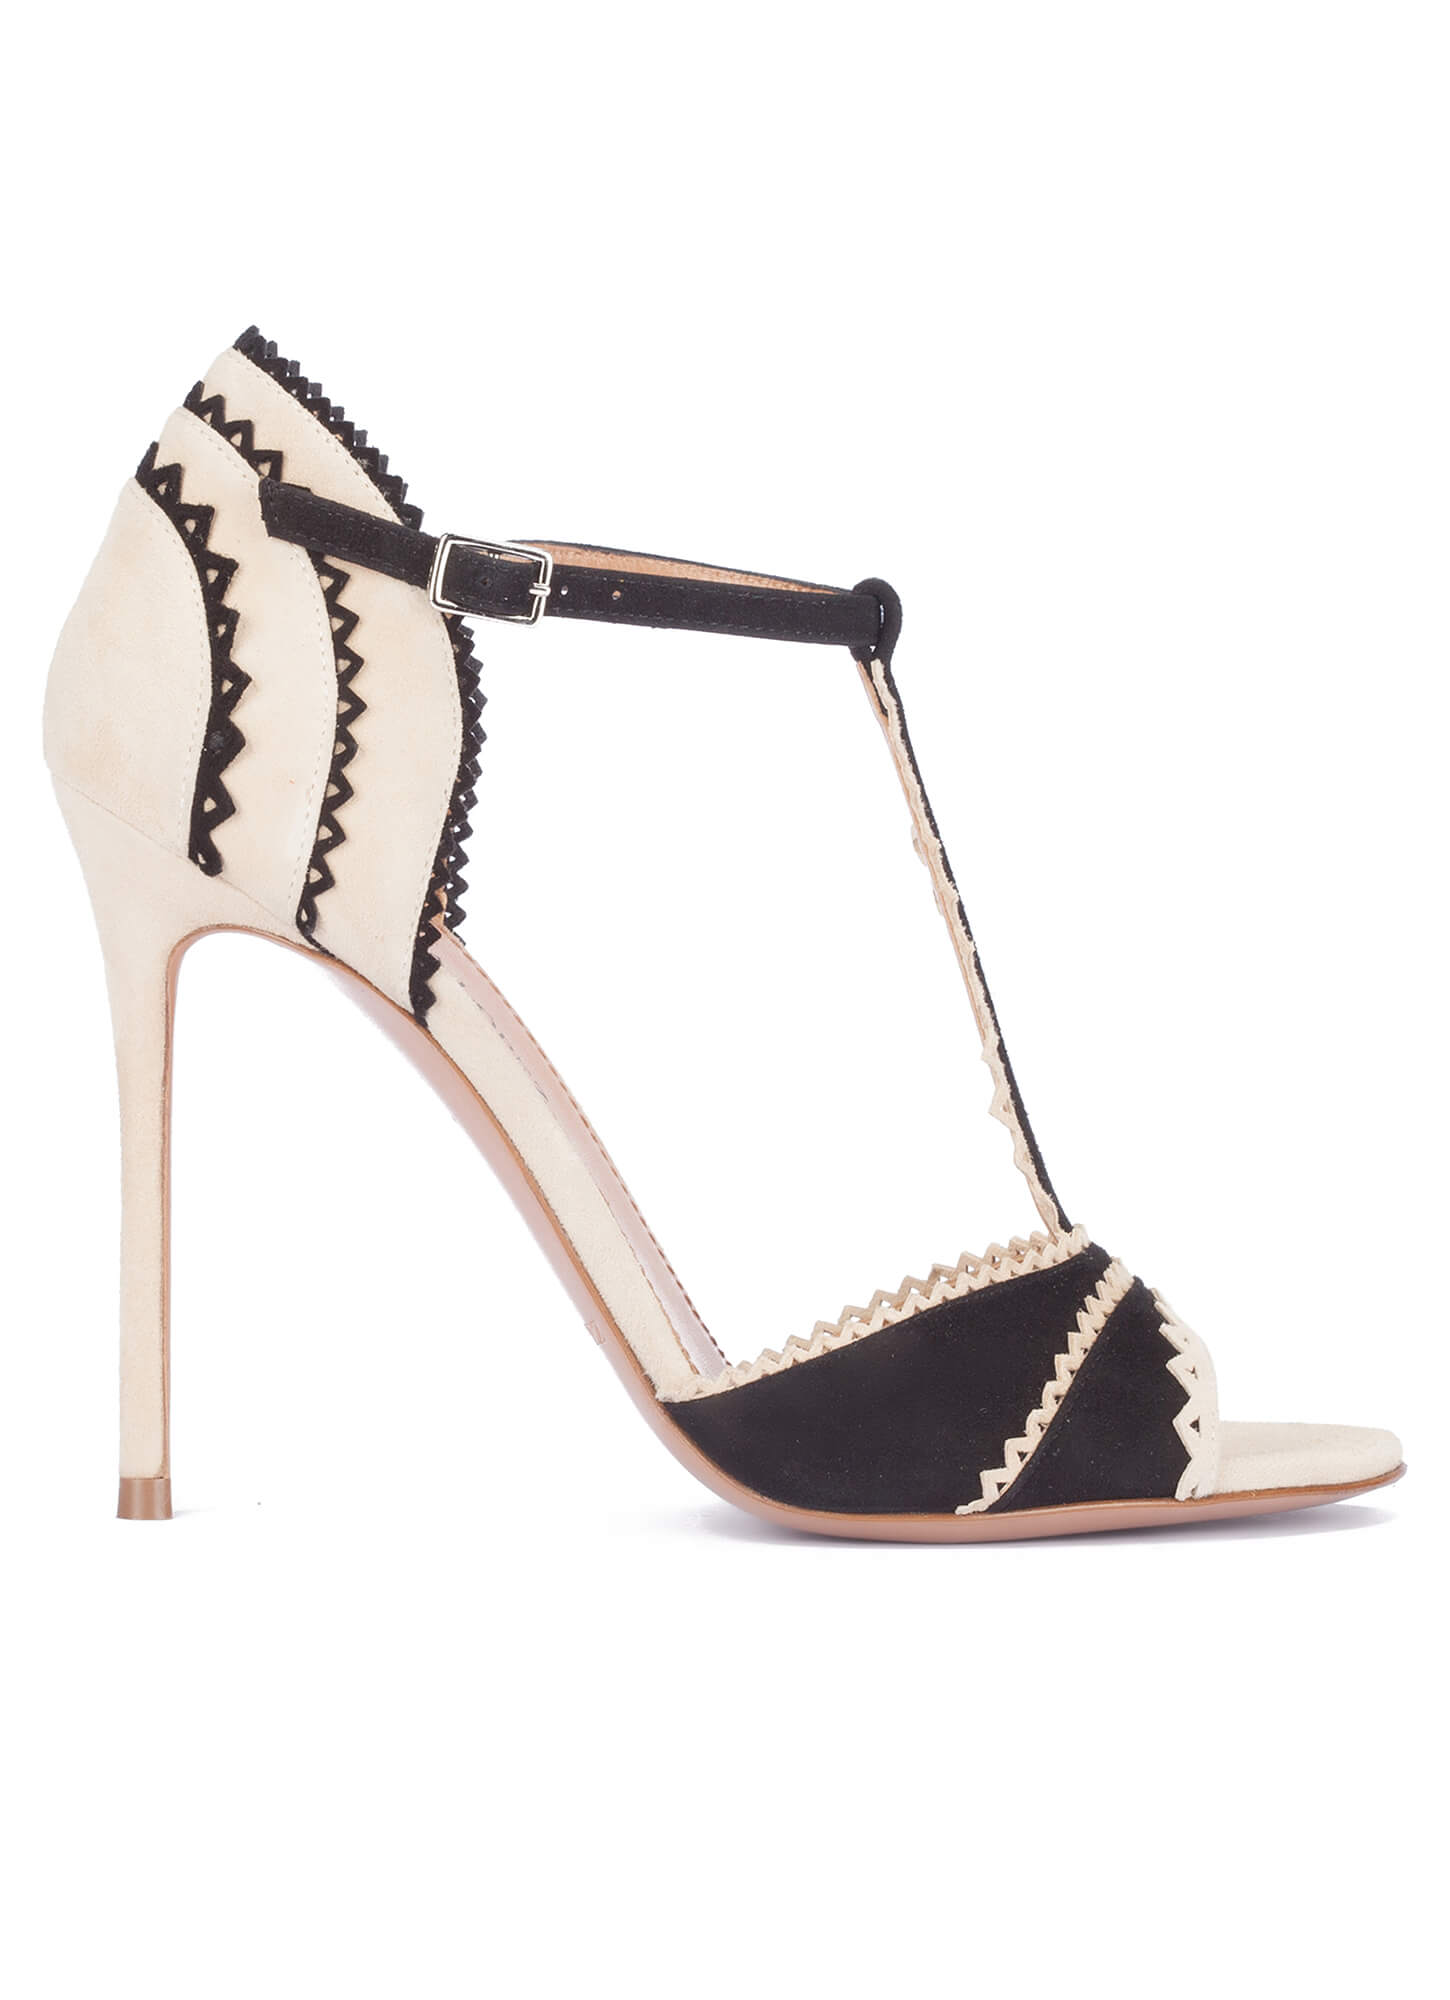 Pura Lopez High heeled sandals - black/sand N48pJfc12